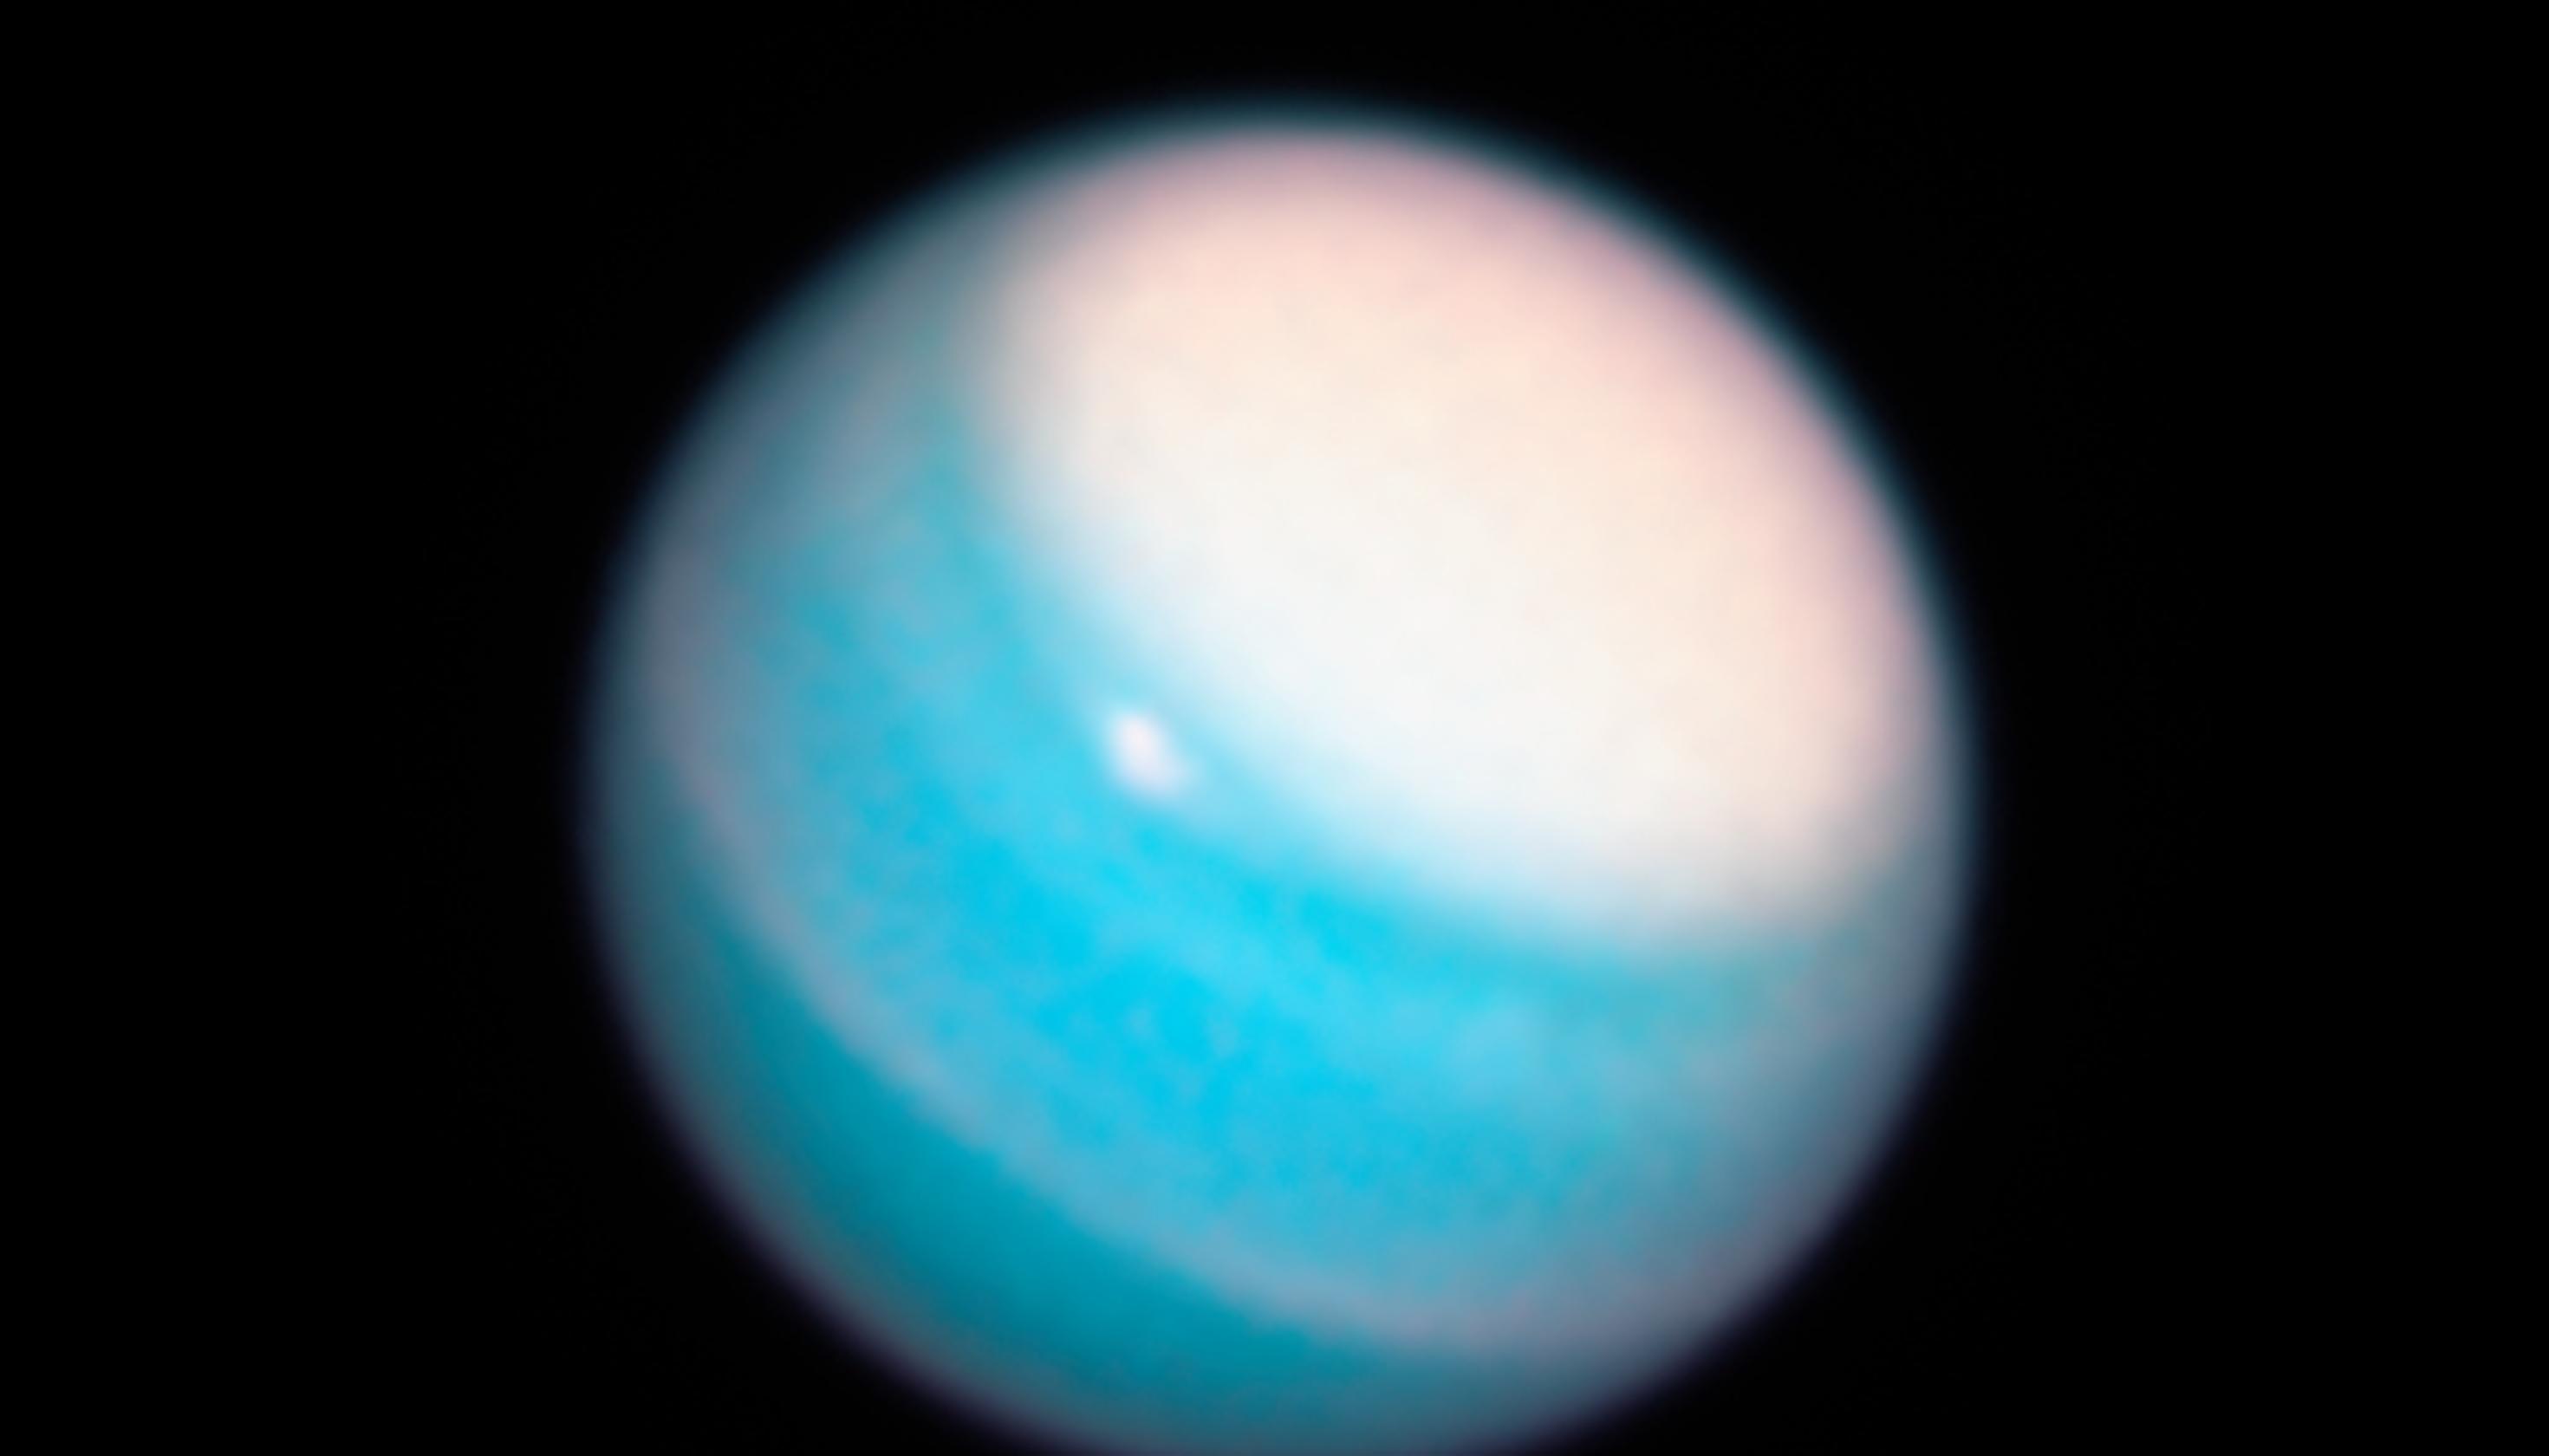 uranus hubble telescope - HD2941×1680